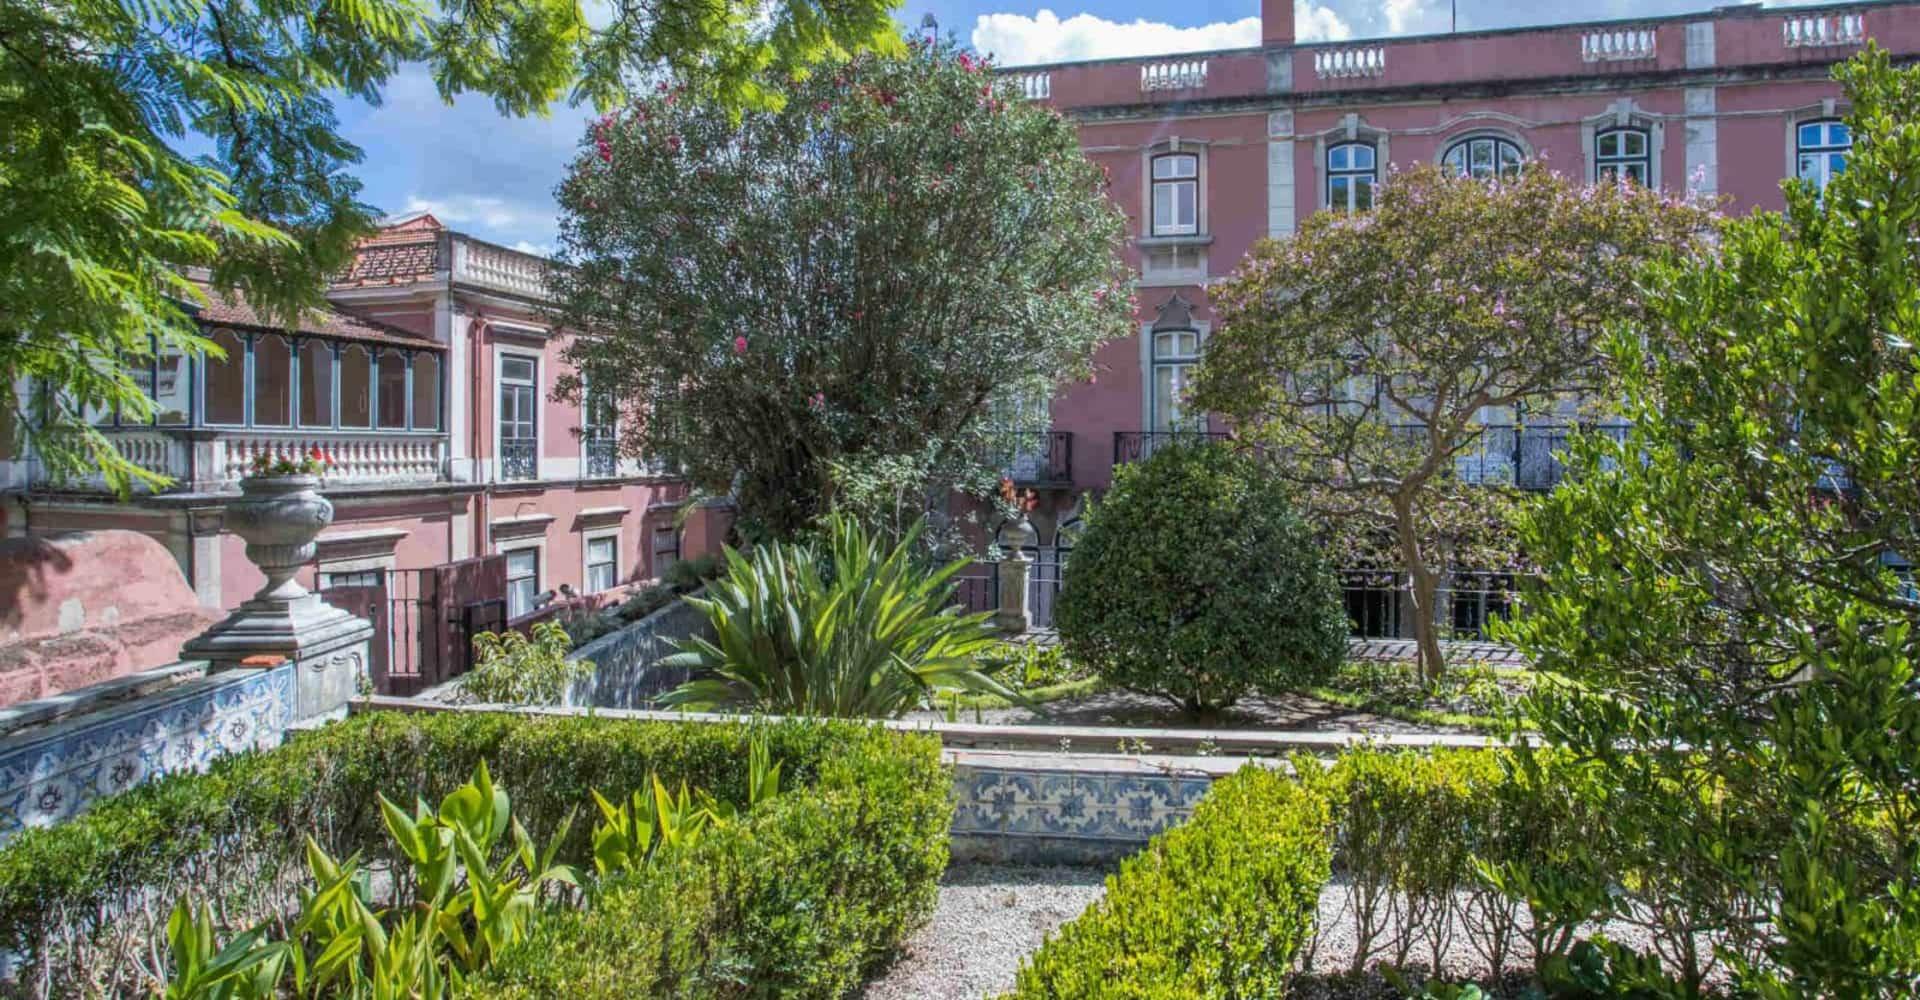 OPENING 2020 - The Pavilions Lisbon